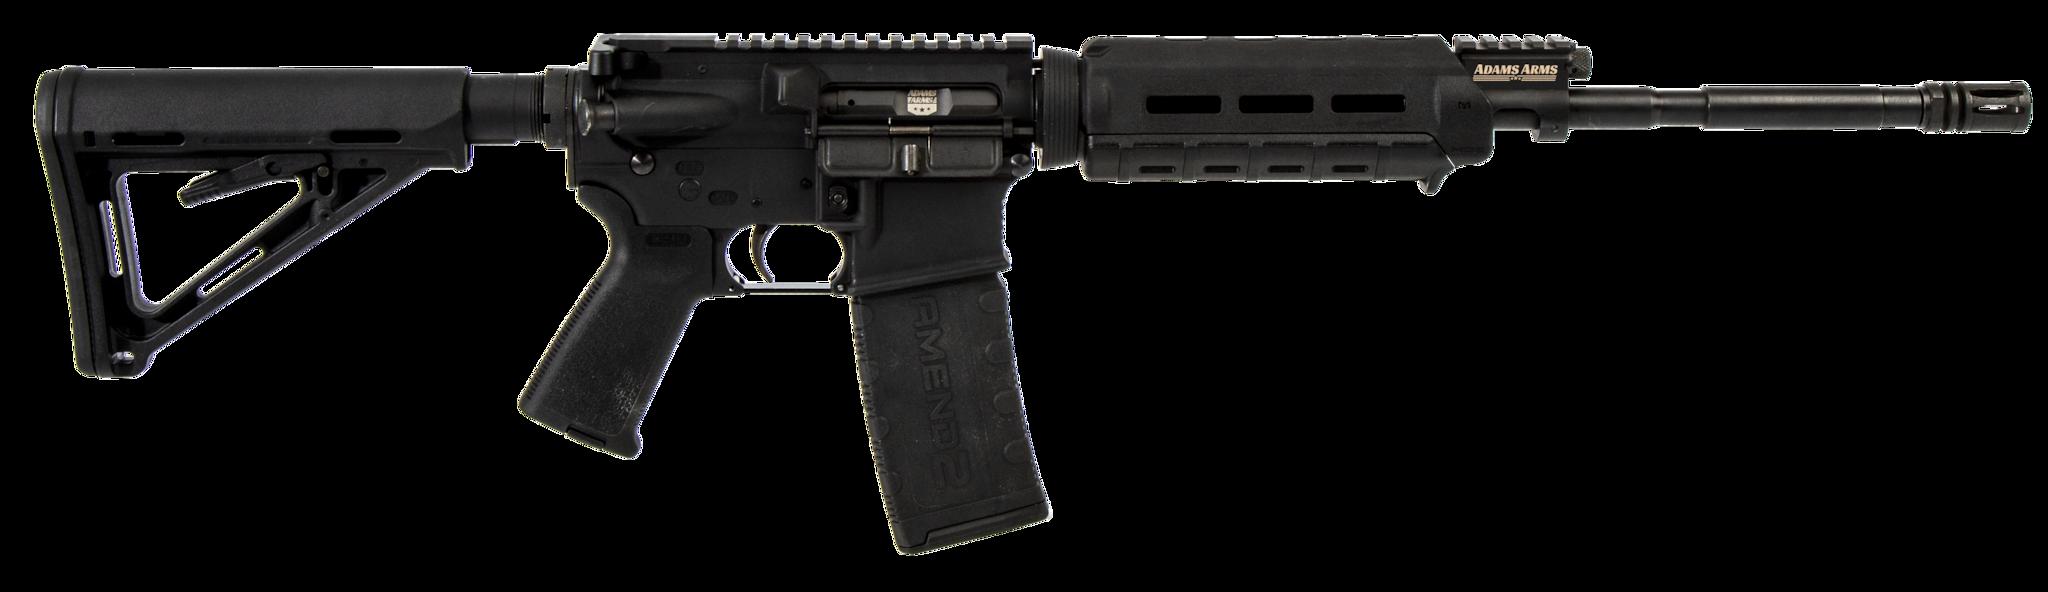 ADAMS ARMS P1